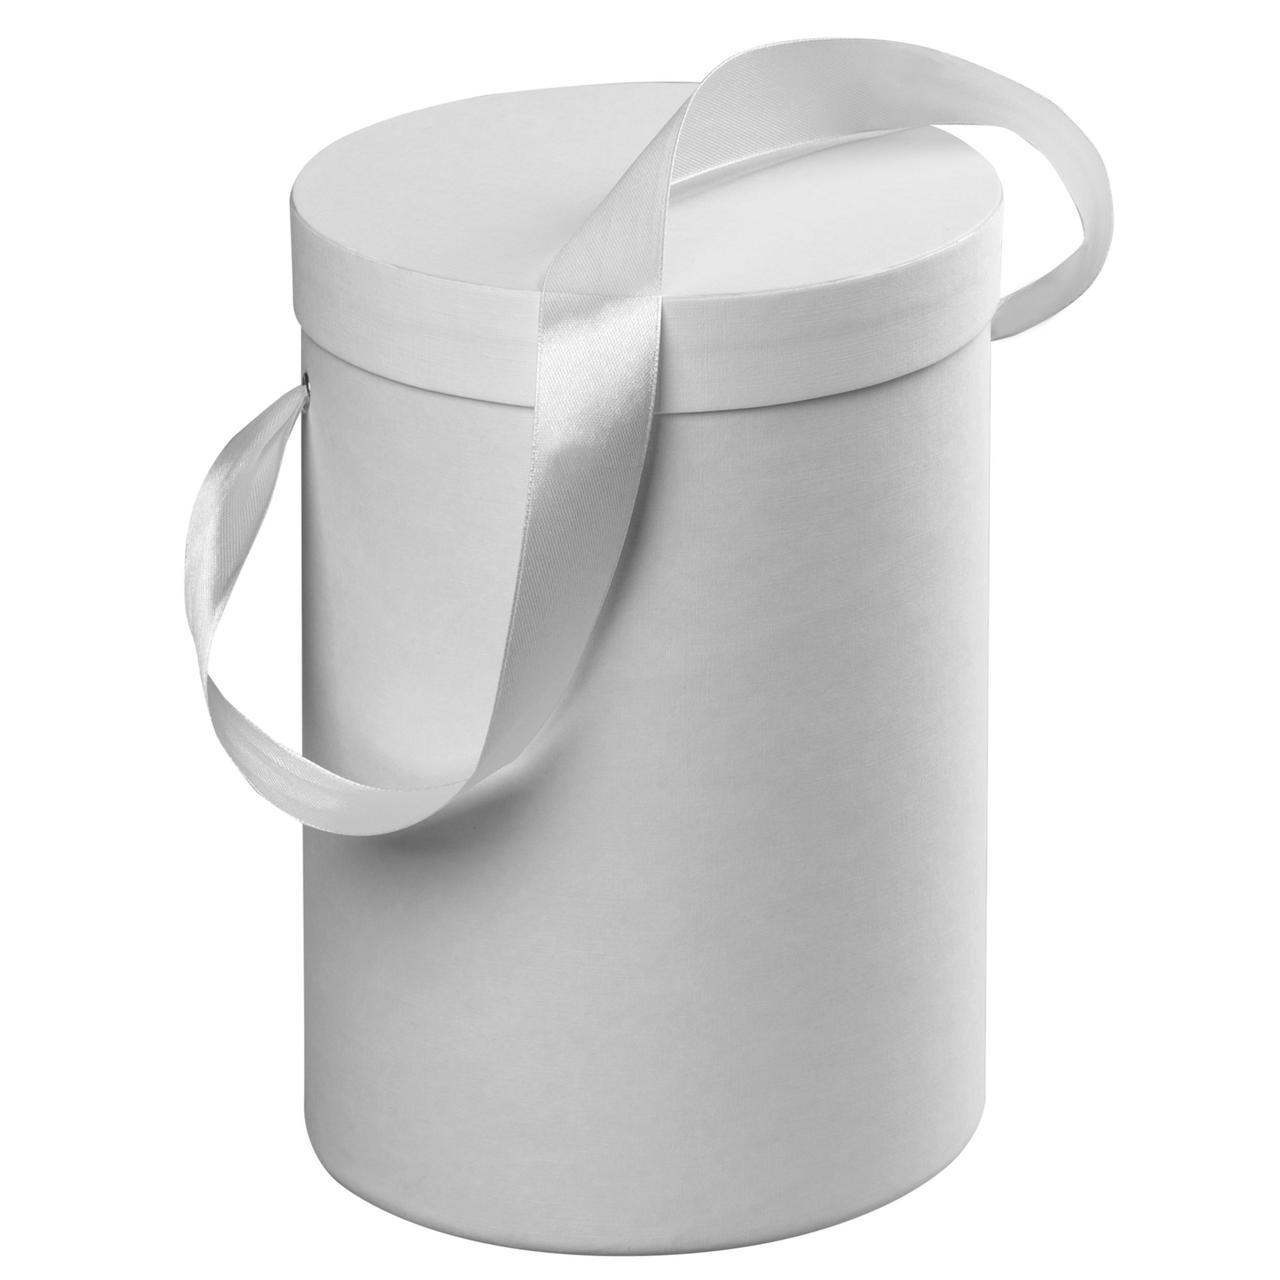 Подарочная коробка Rond, белая